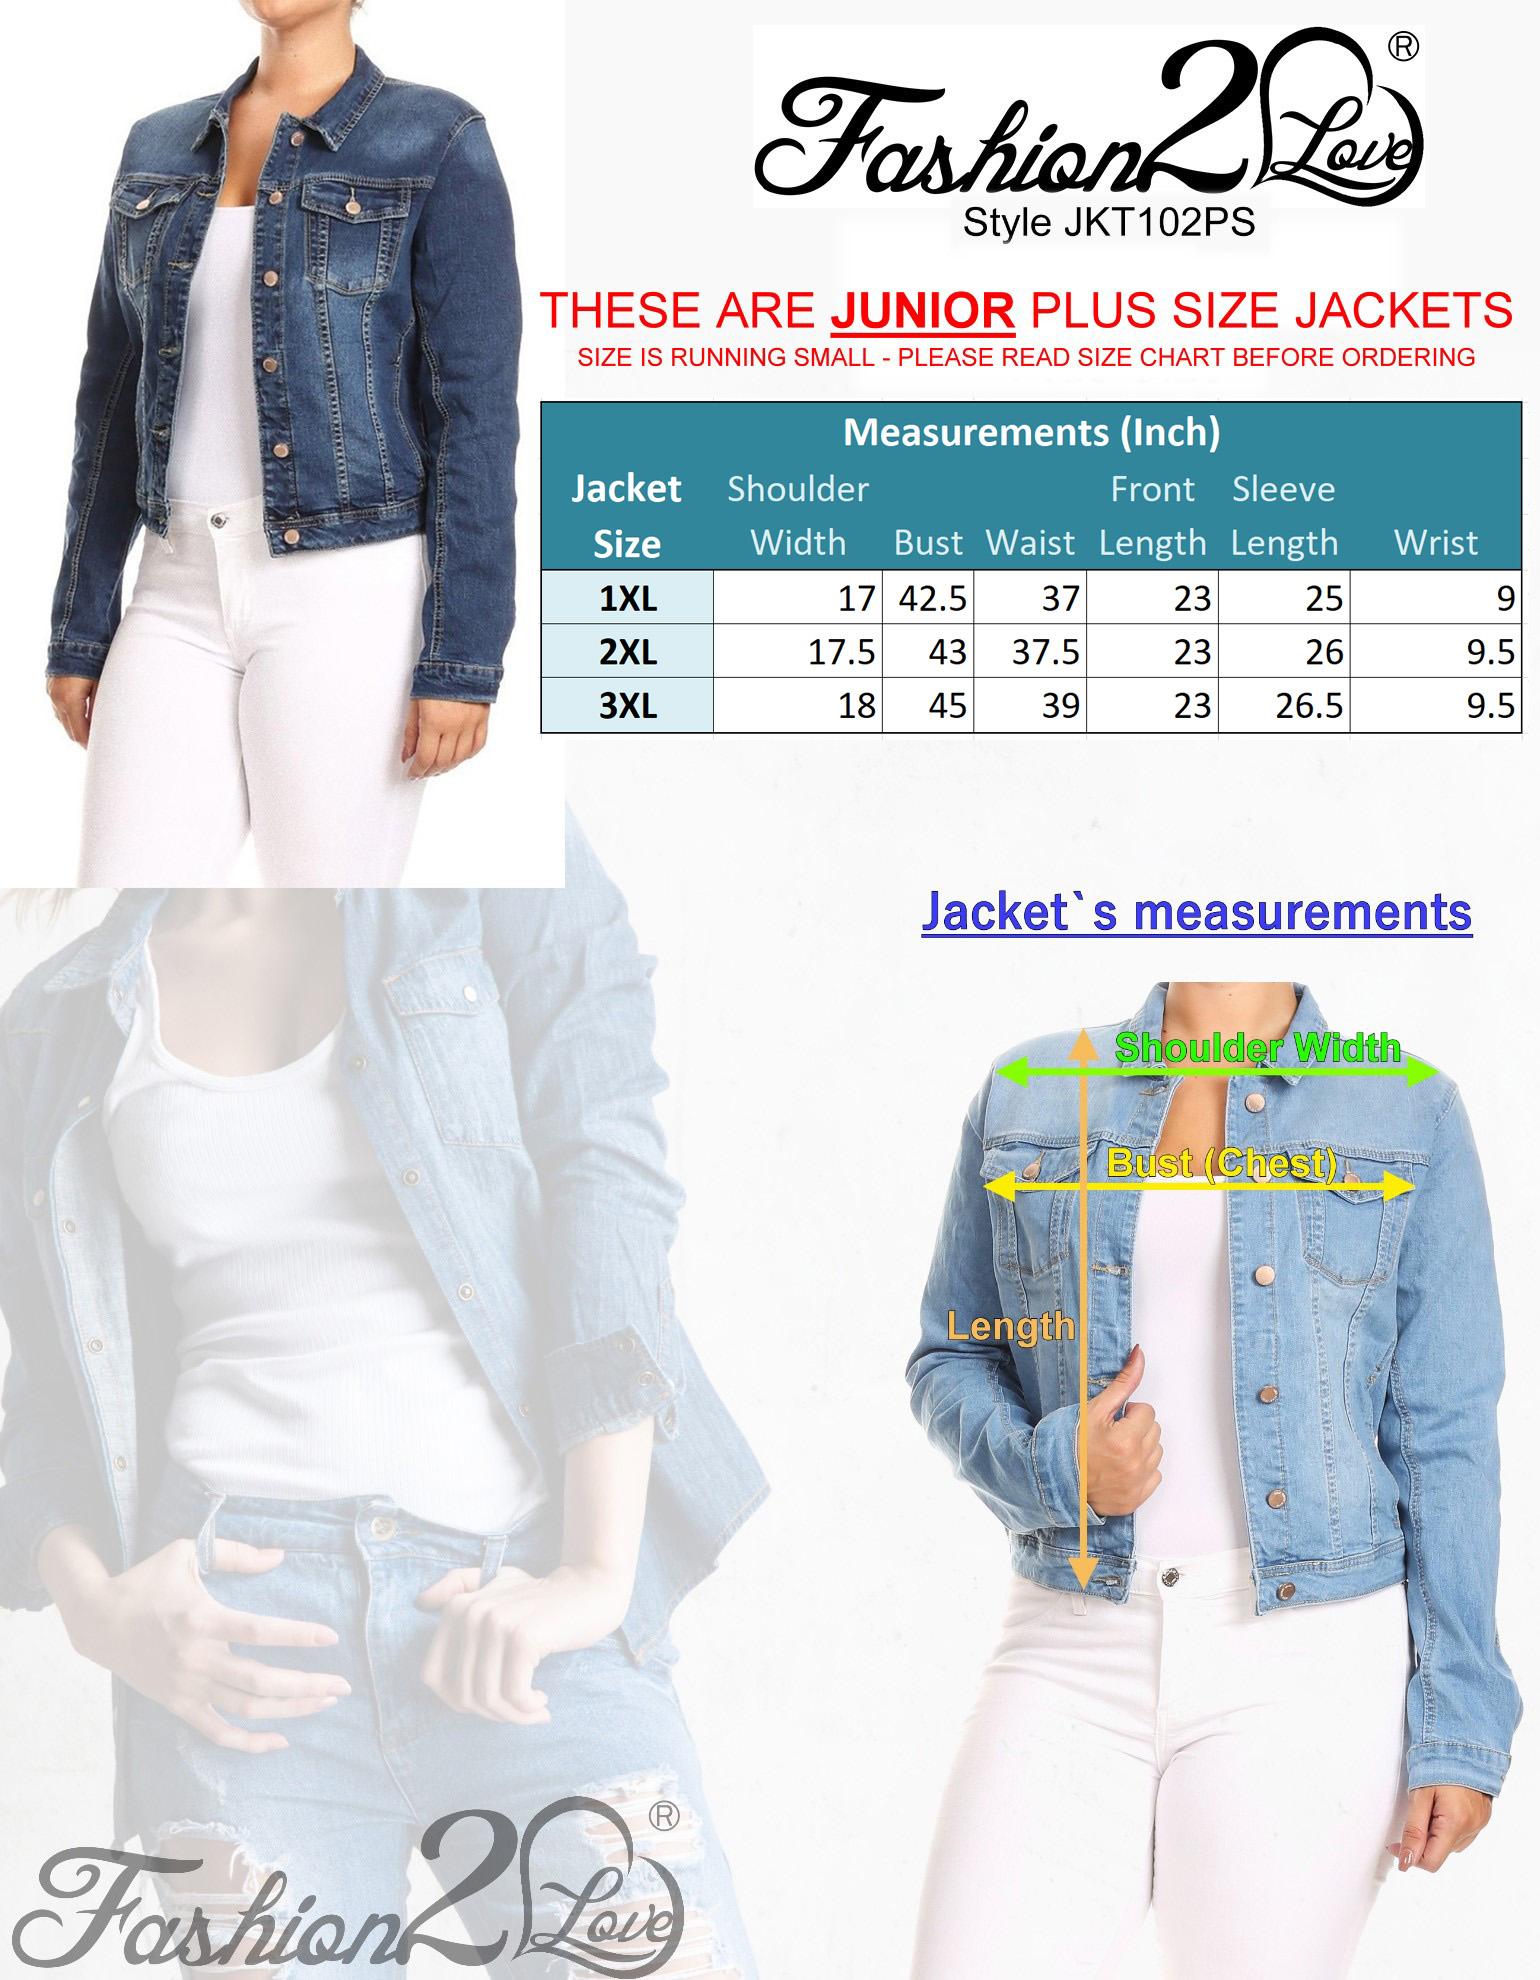 JKT102PS-Women-039-s-Plus-Size-Premium-Denim-Jackets-Long-Sleeve-Loose-Jean-Coats thumbnail 14